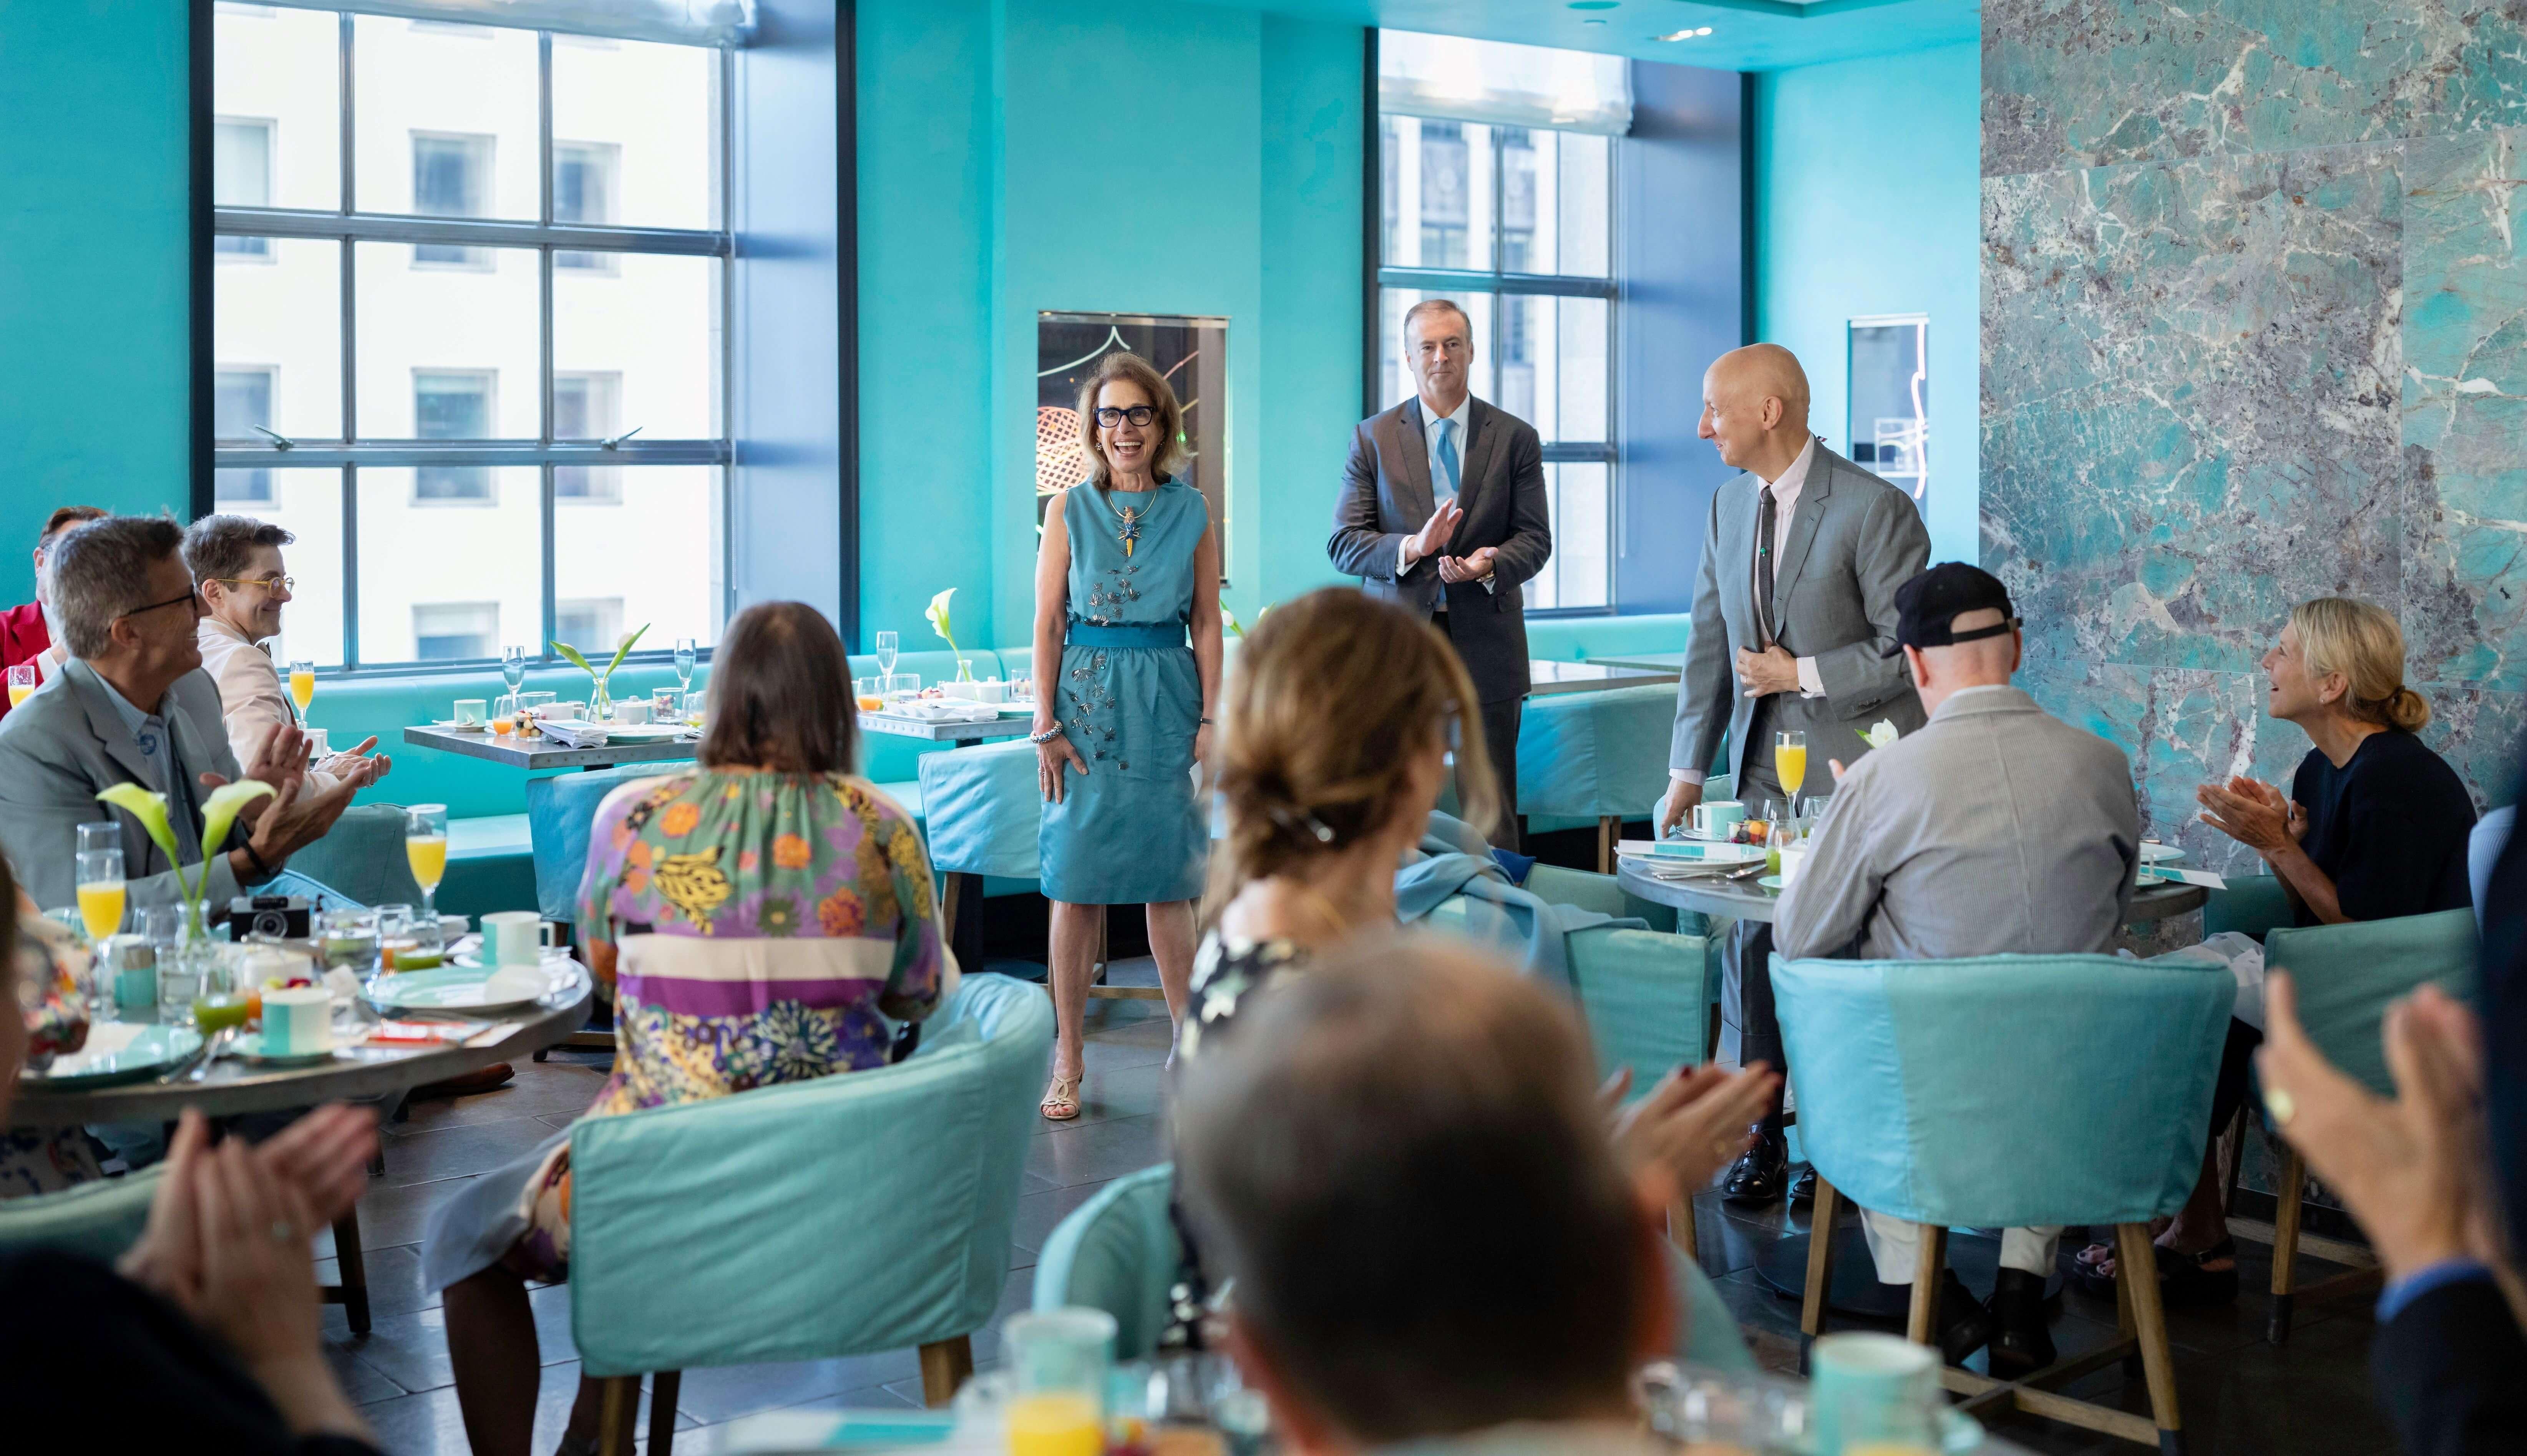 Cunard Sets Sail for 4th Annual Transatlantic Fashion Week with Breakfast at Tiffany's Blue Box Cafe